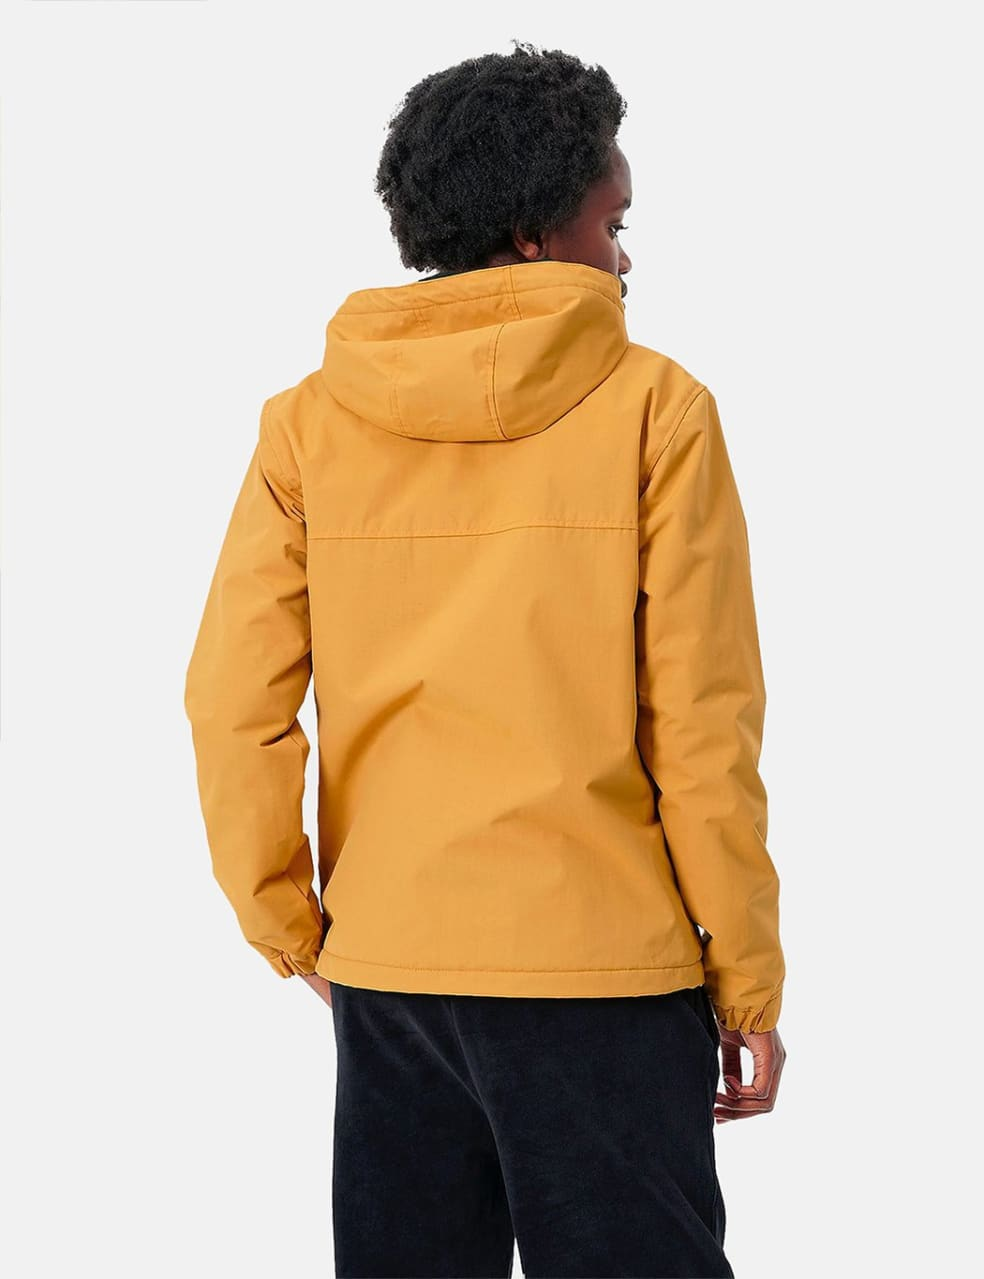 Womens Carhartt-WIP Nimbus Half-Zip Jacket (Fleece Lined) - Winter Sun | Jacket by Carhartt WIP 3